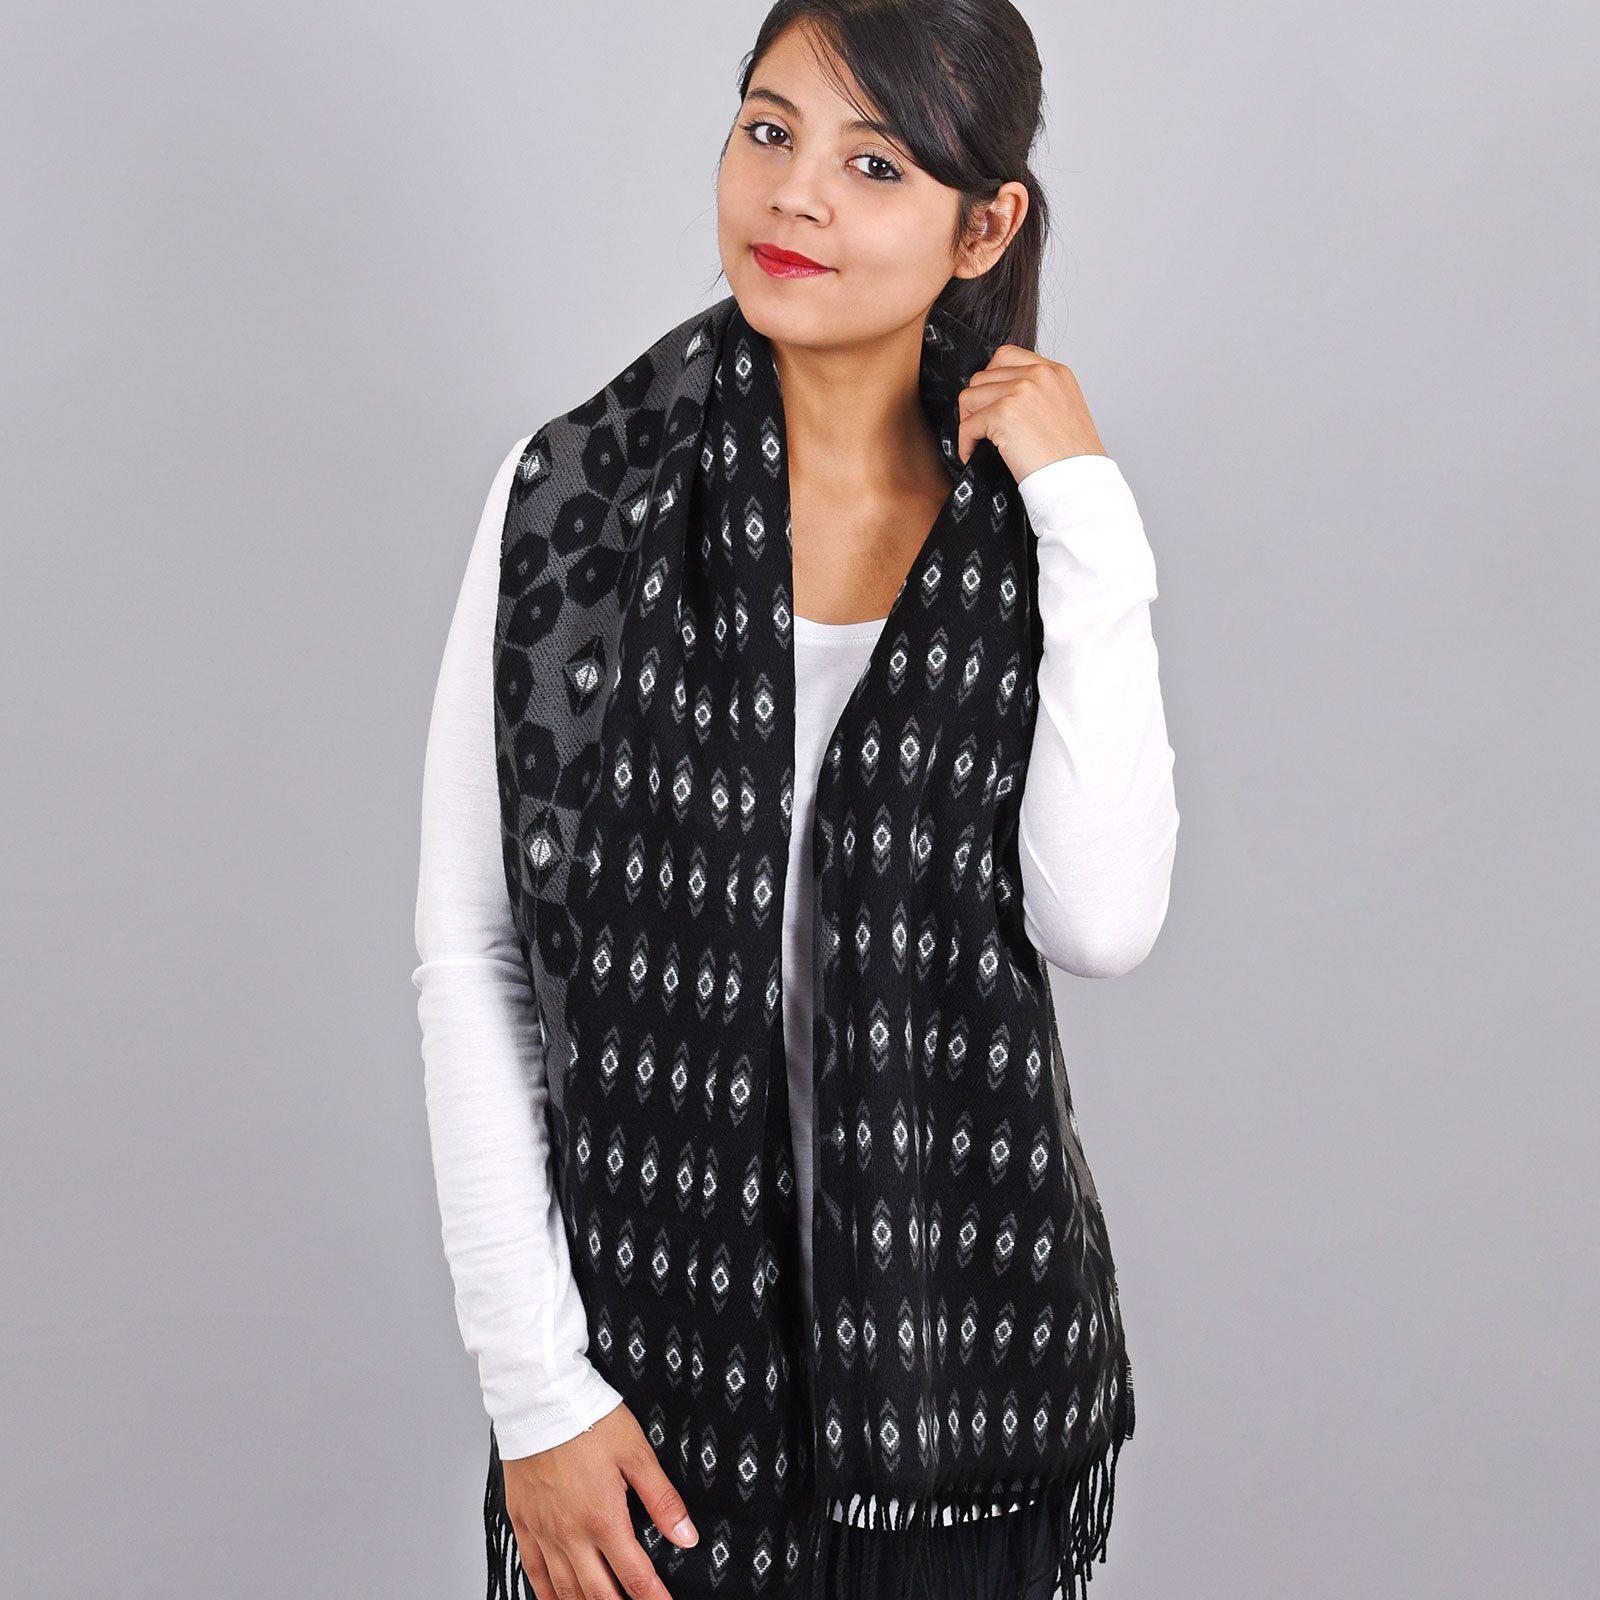 http://lookbook.allee-du-foulard.fr/wp-content/uploads/2019/01/AT-03463-VF16-2-chale-franges-motifs-geometriques-noir-gris-1600x1600.jpg